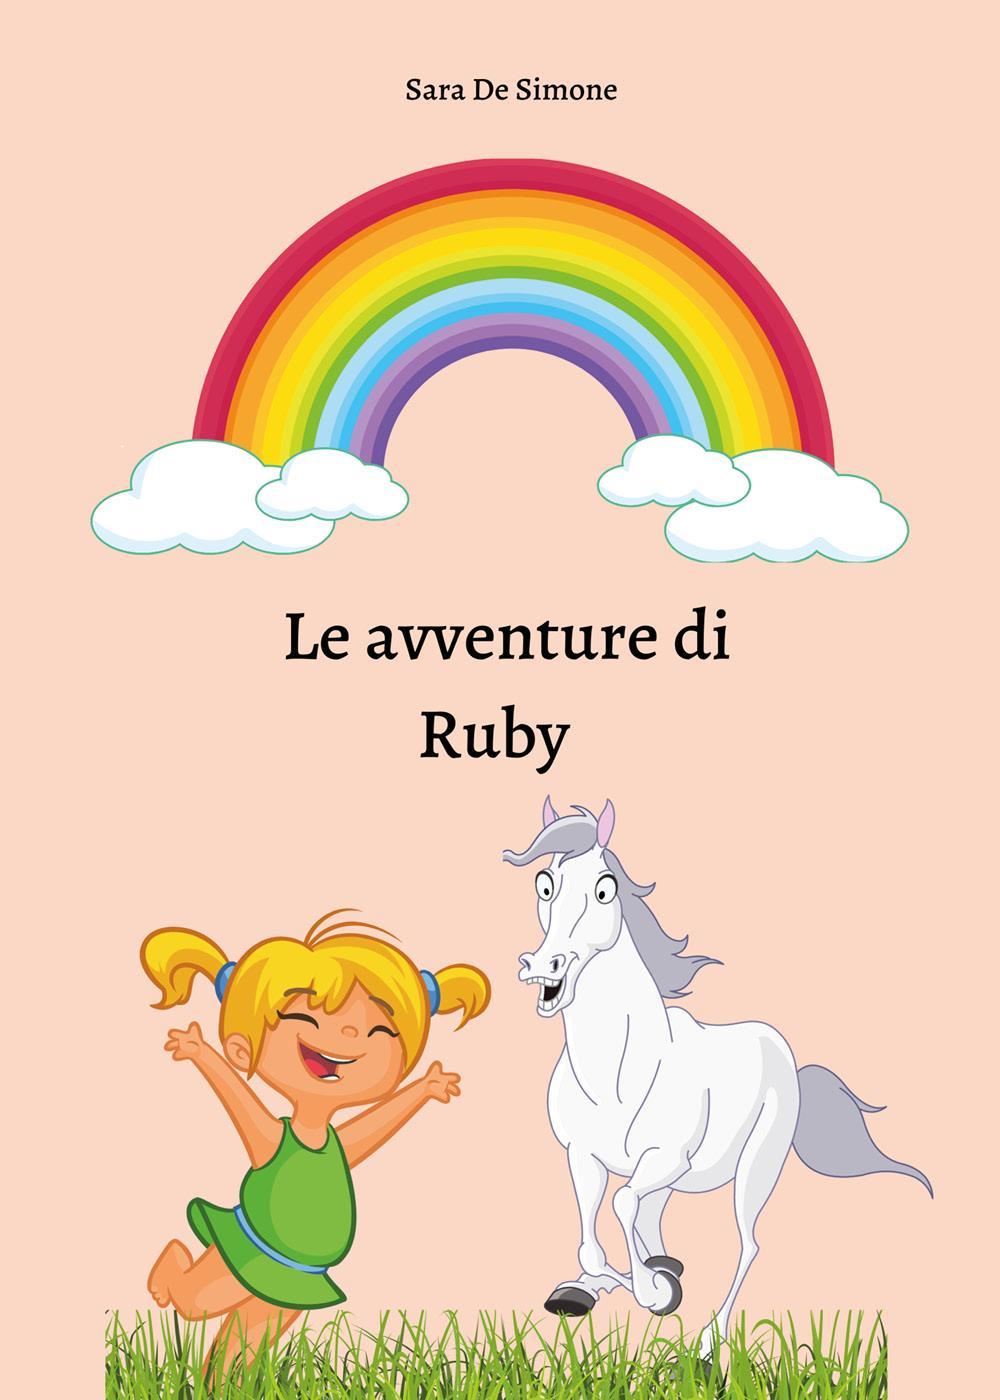 Le avventure di Ruby